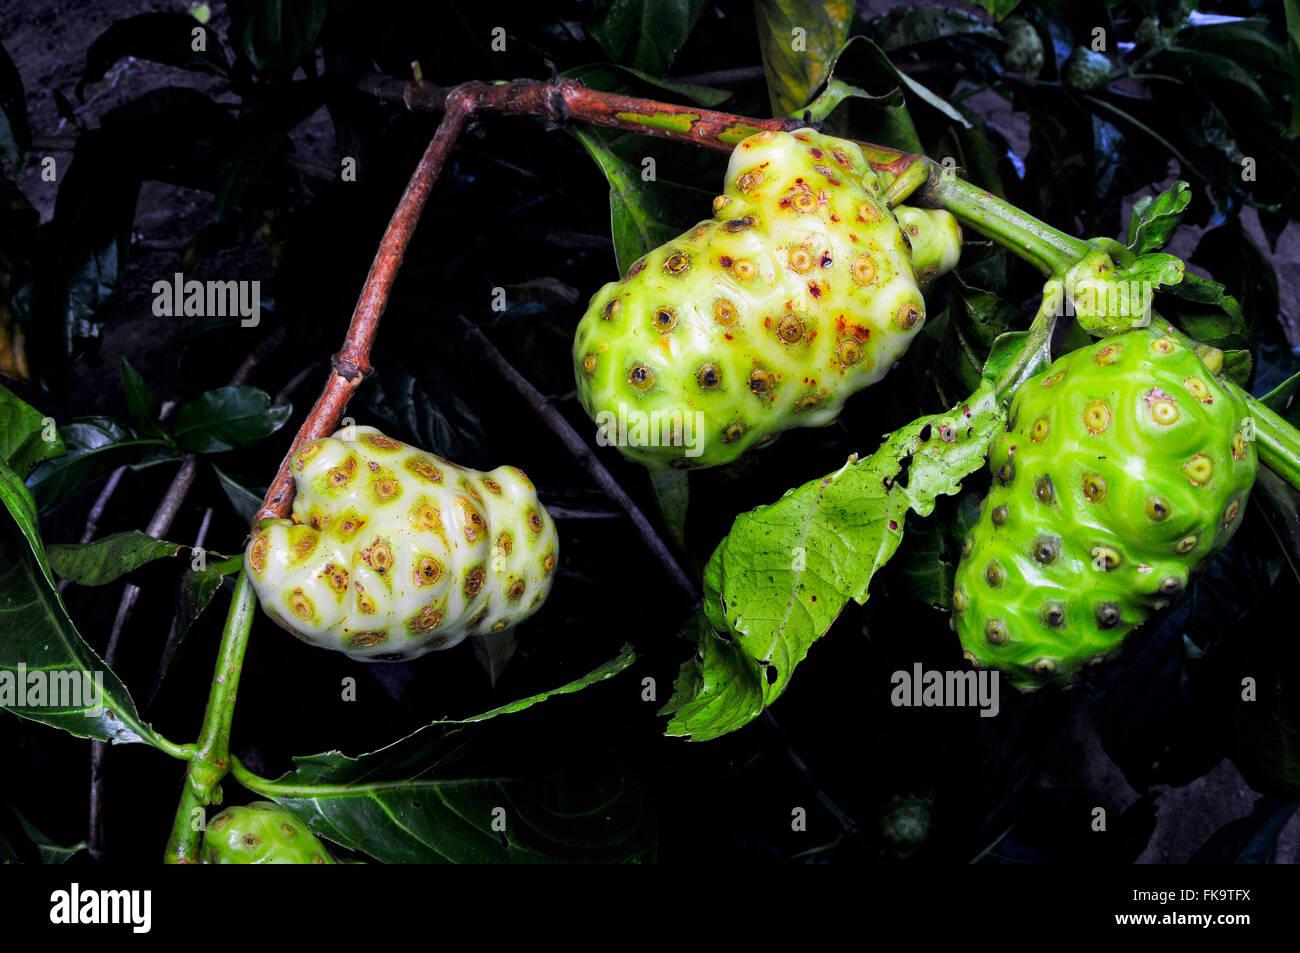 Detail of small fruit tree called Noni - Morinda citrifolia - Stock Image